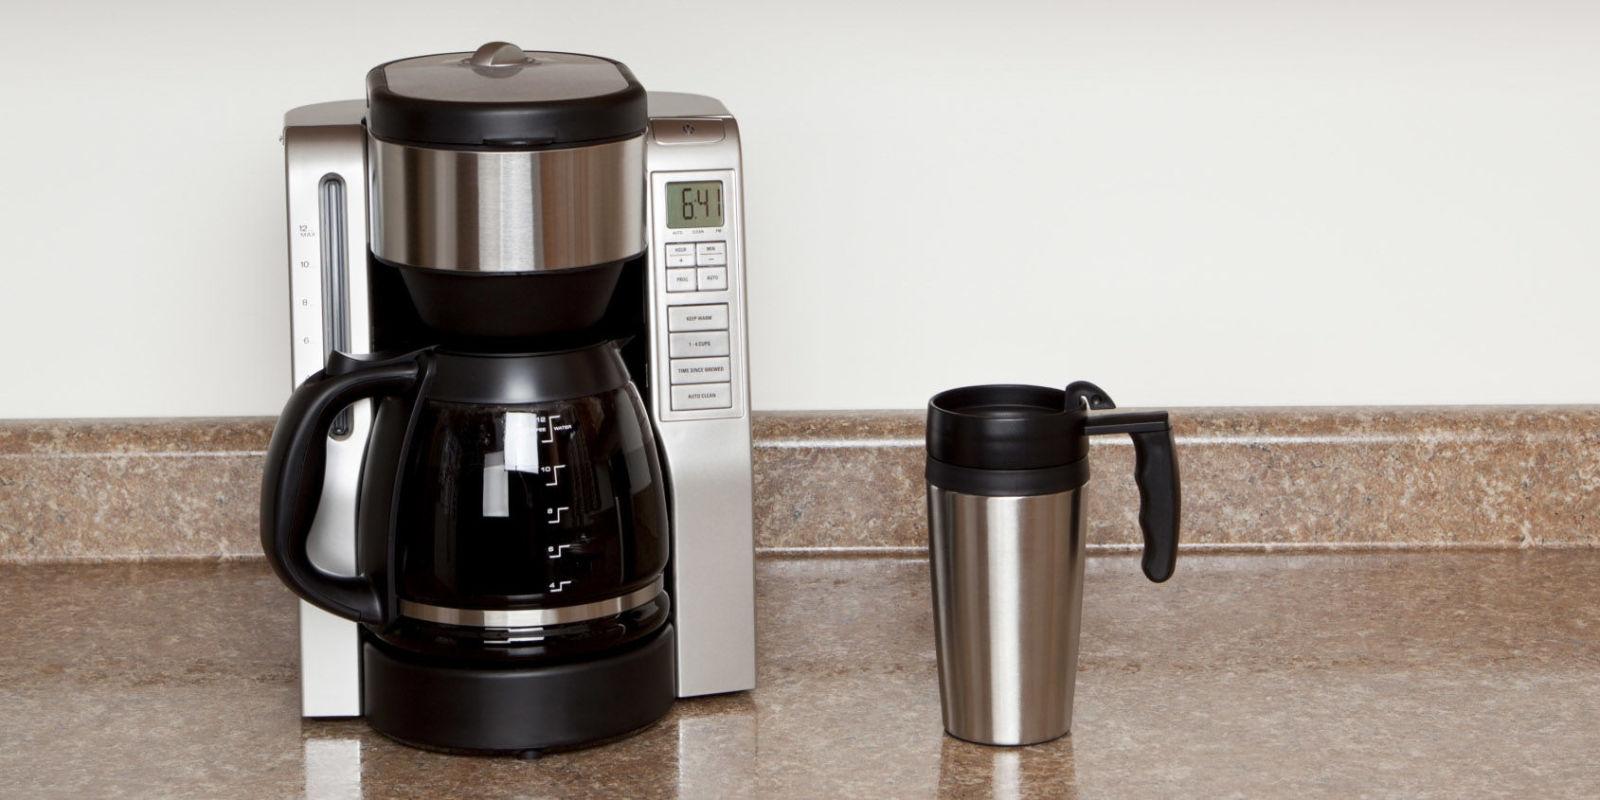 Coffee Makers and yeti mug on counter